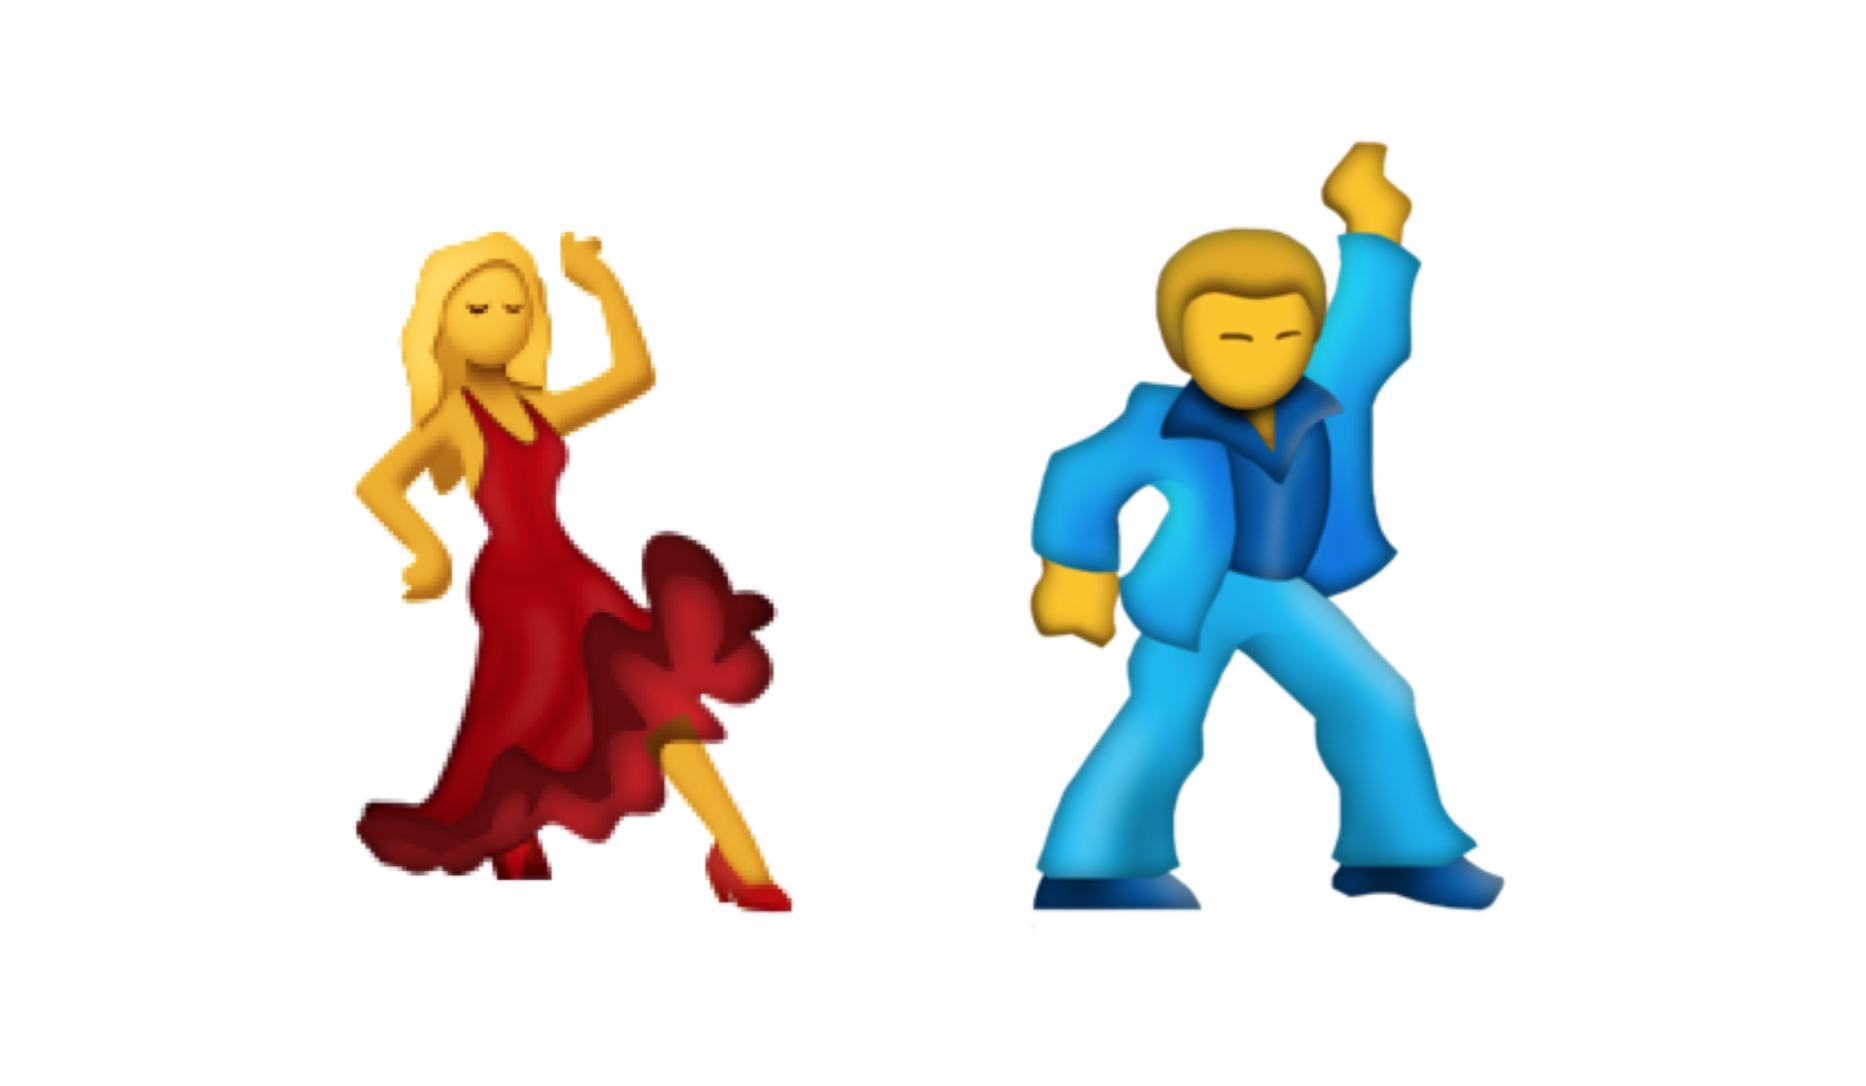 New Emojis Are Coming To A Keyboard Near You Next Year Michigan Radio